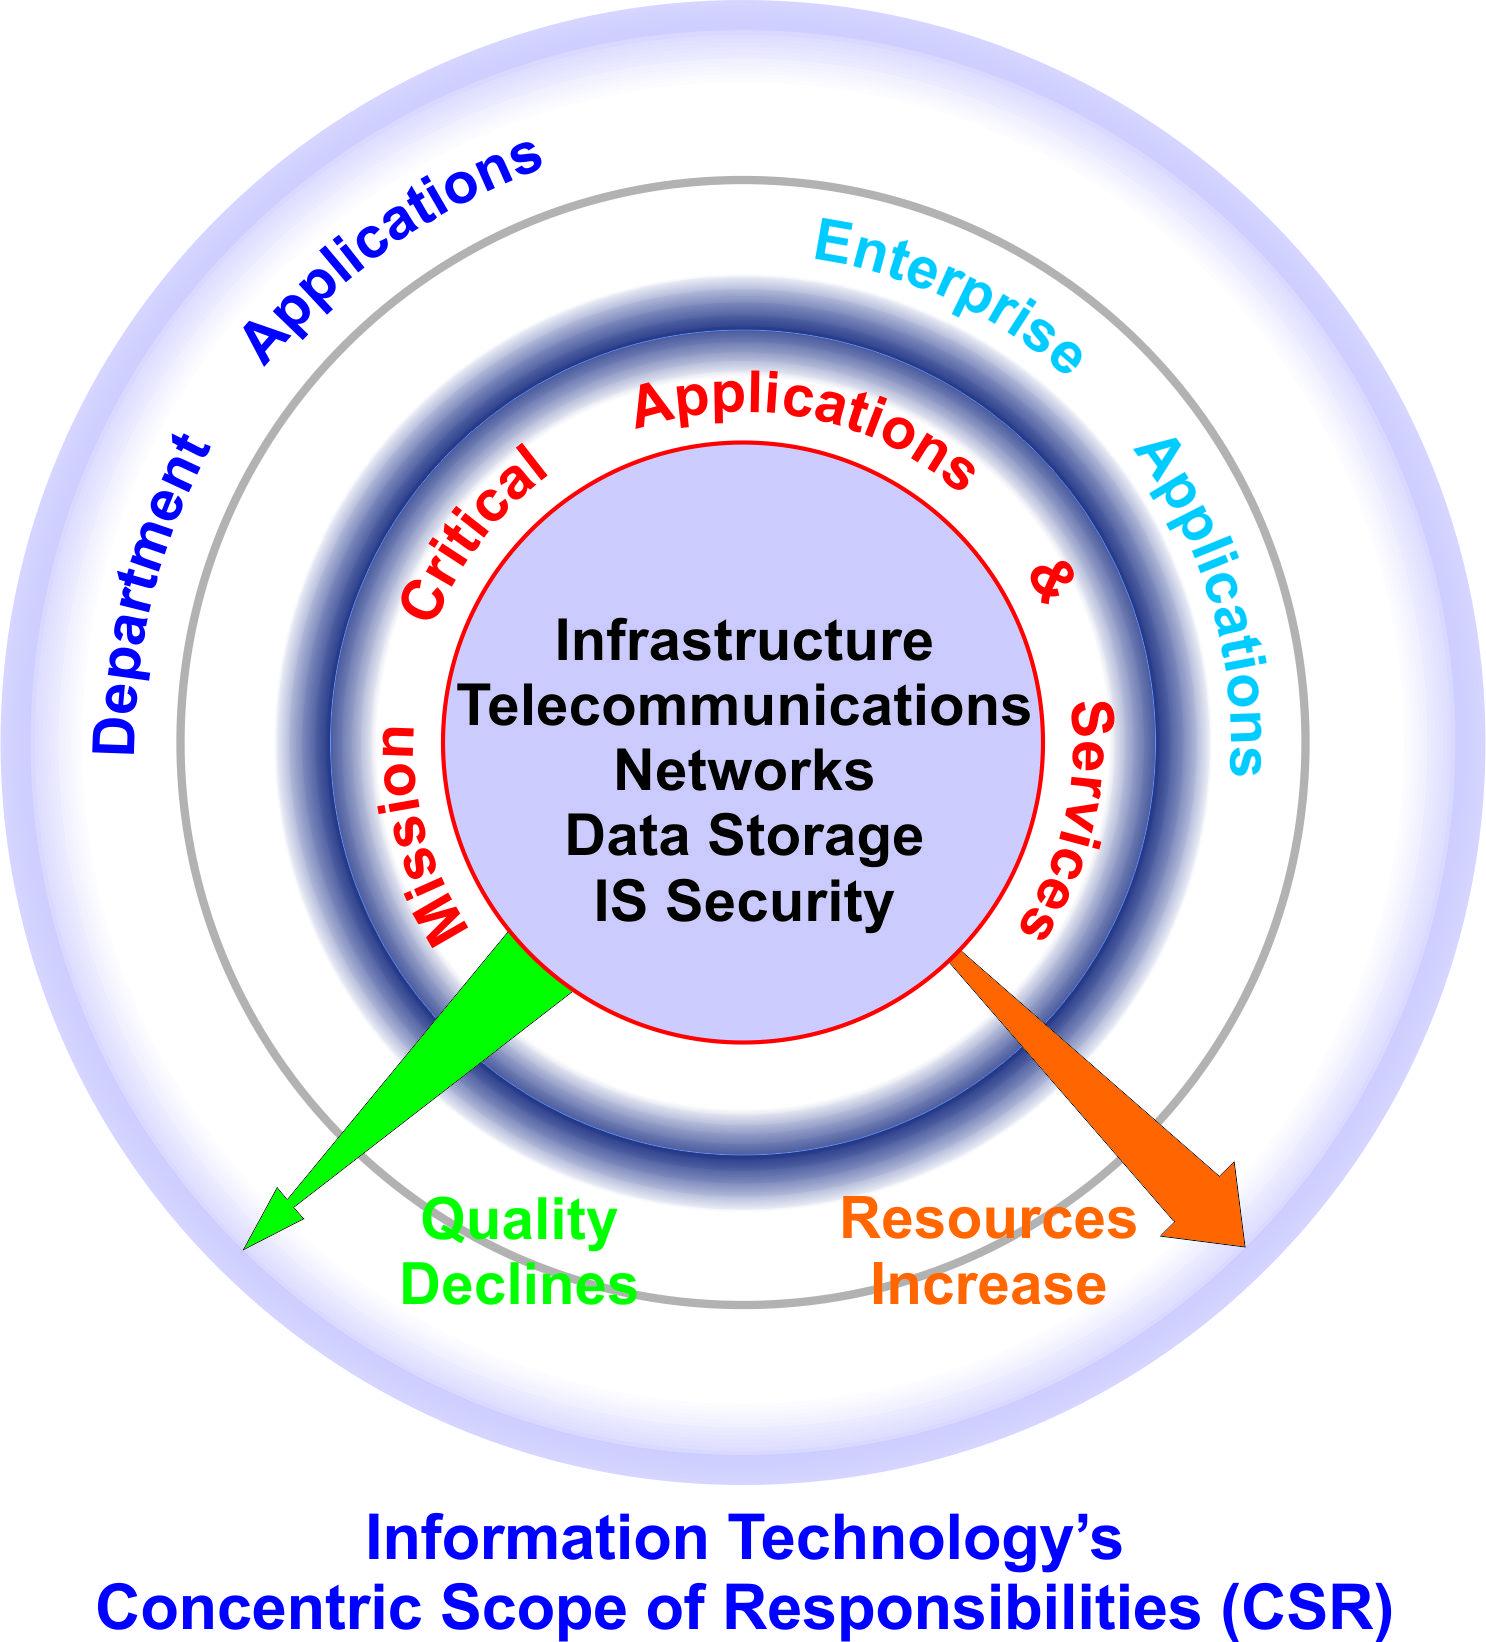 csr - Information Technology Responsibilities